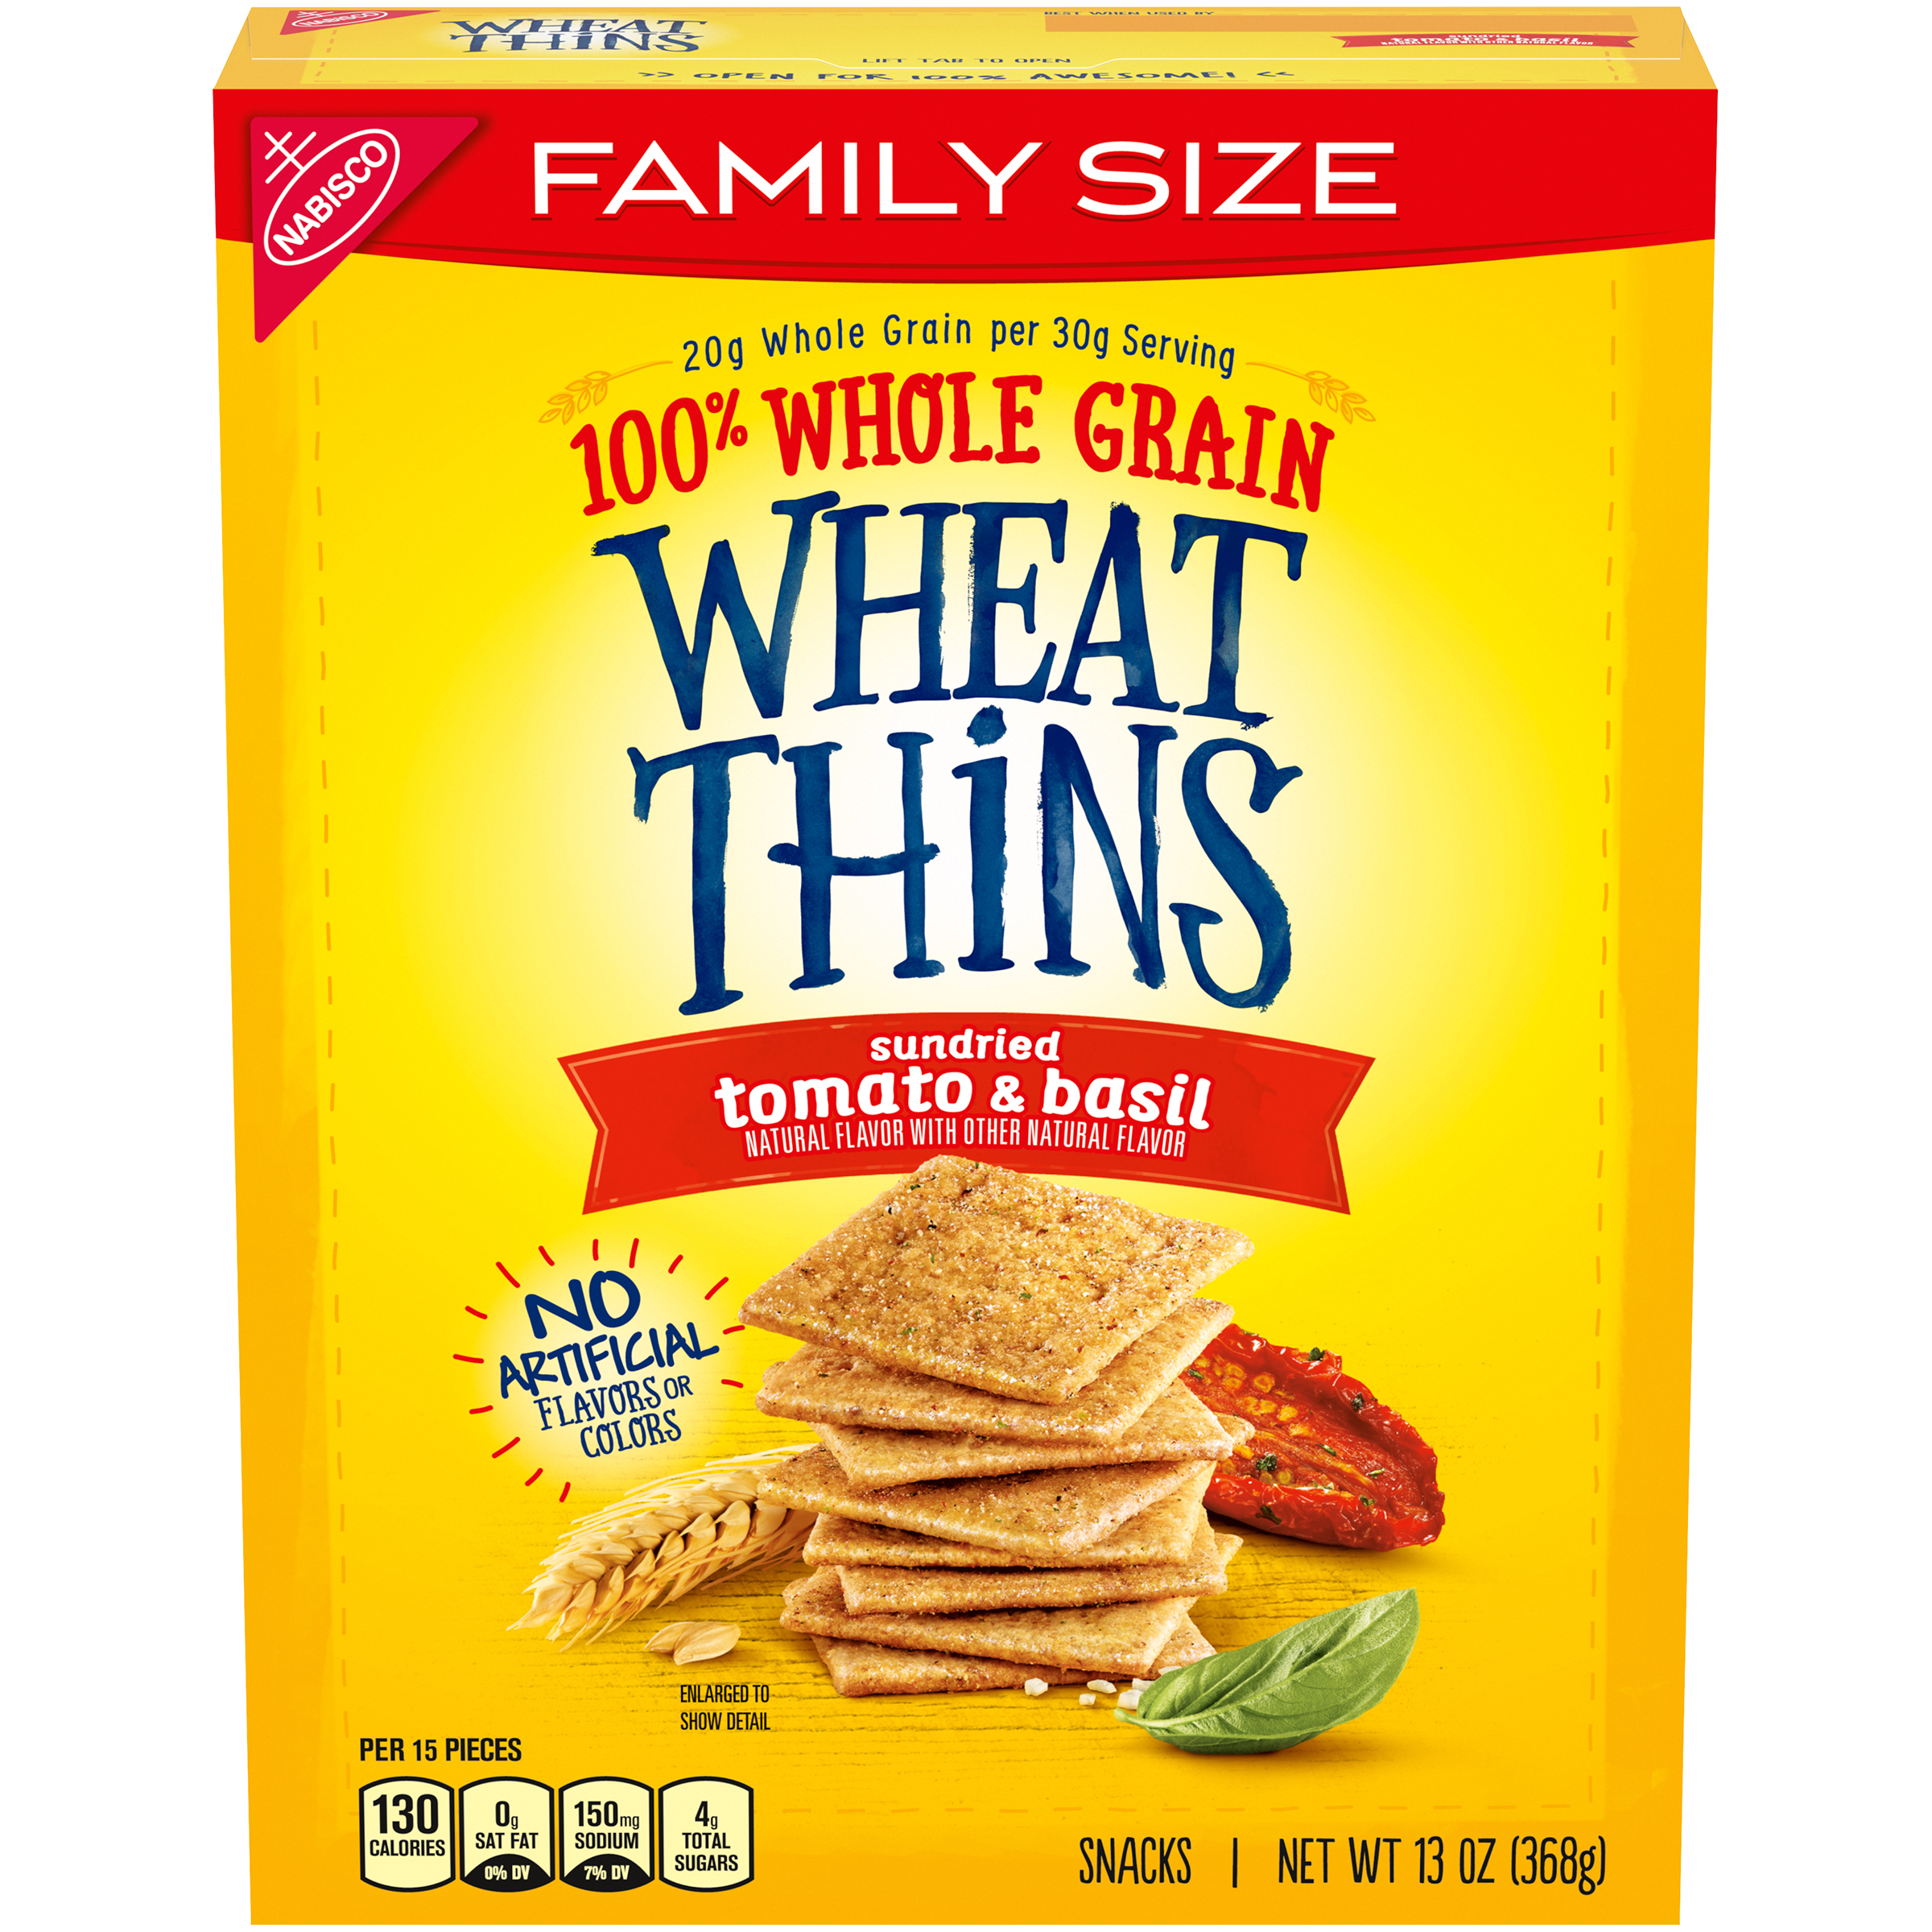 WHEAT THINS Sun Dried Tomato & Basil Crackers 13.0 Oz